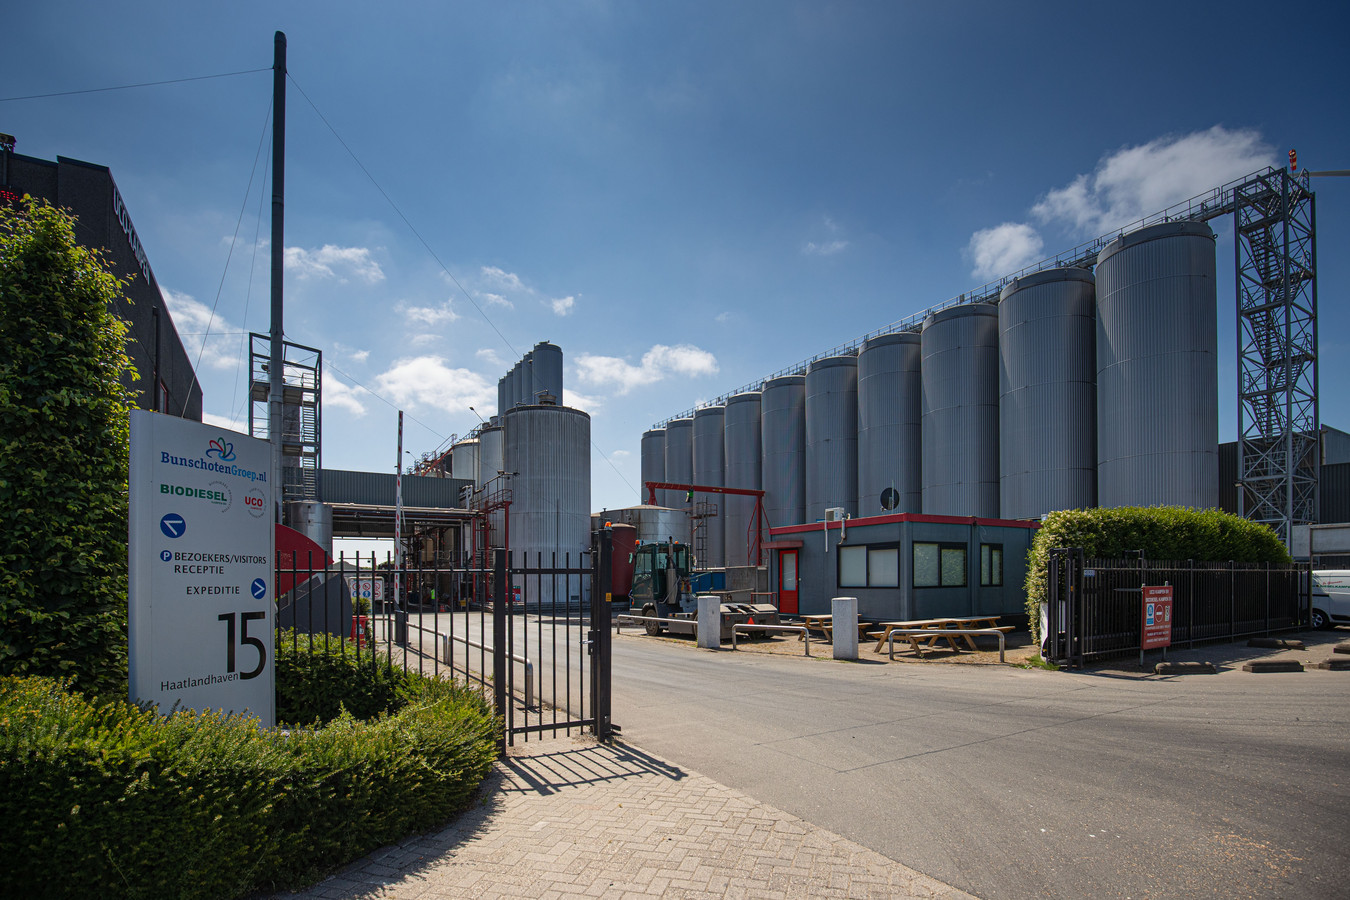 Biodiesel Kampen wordt verdacht van biodieselfraude.